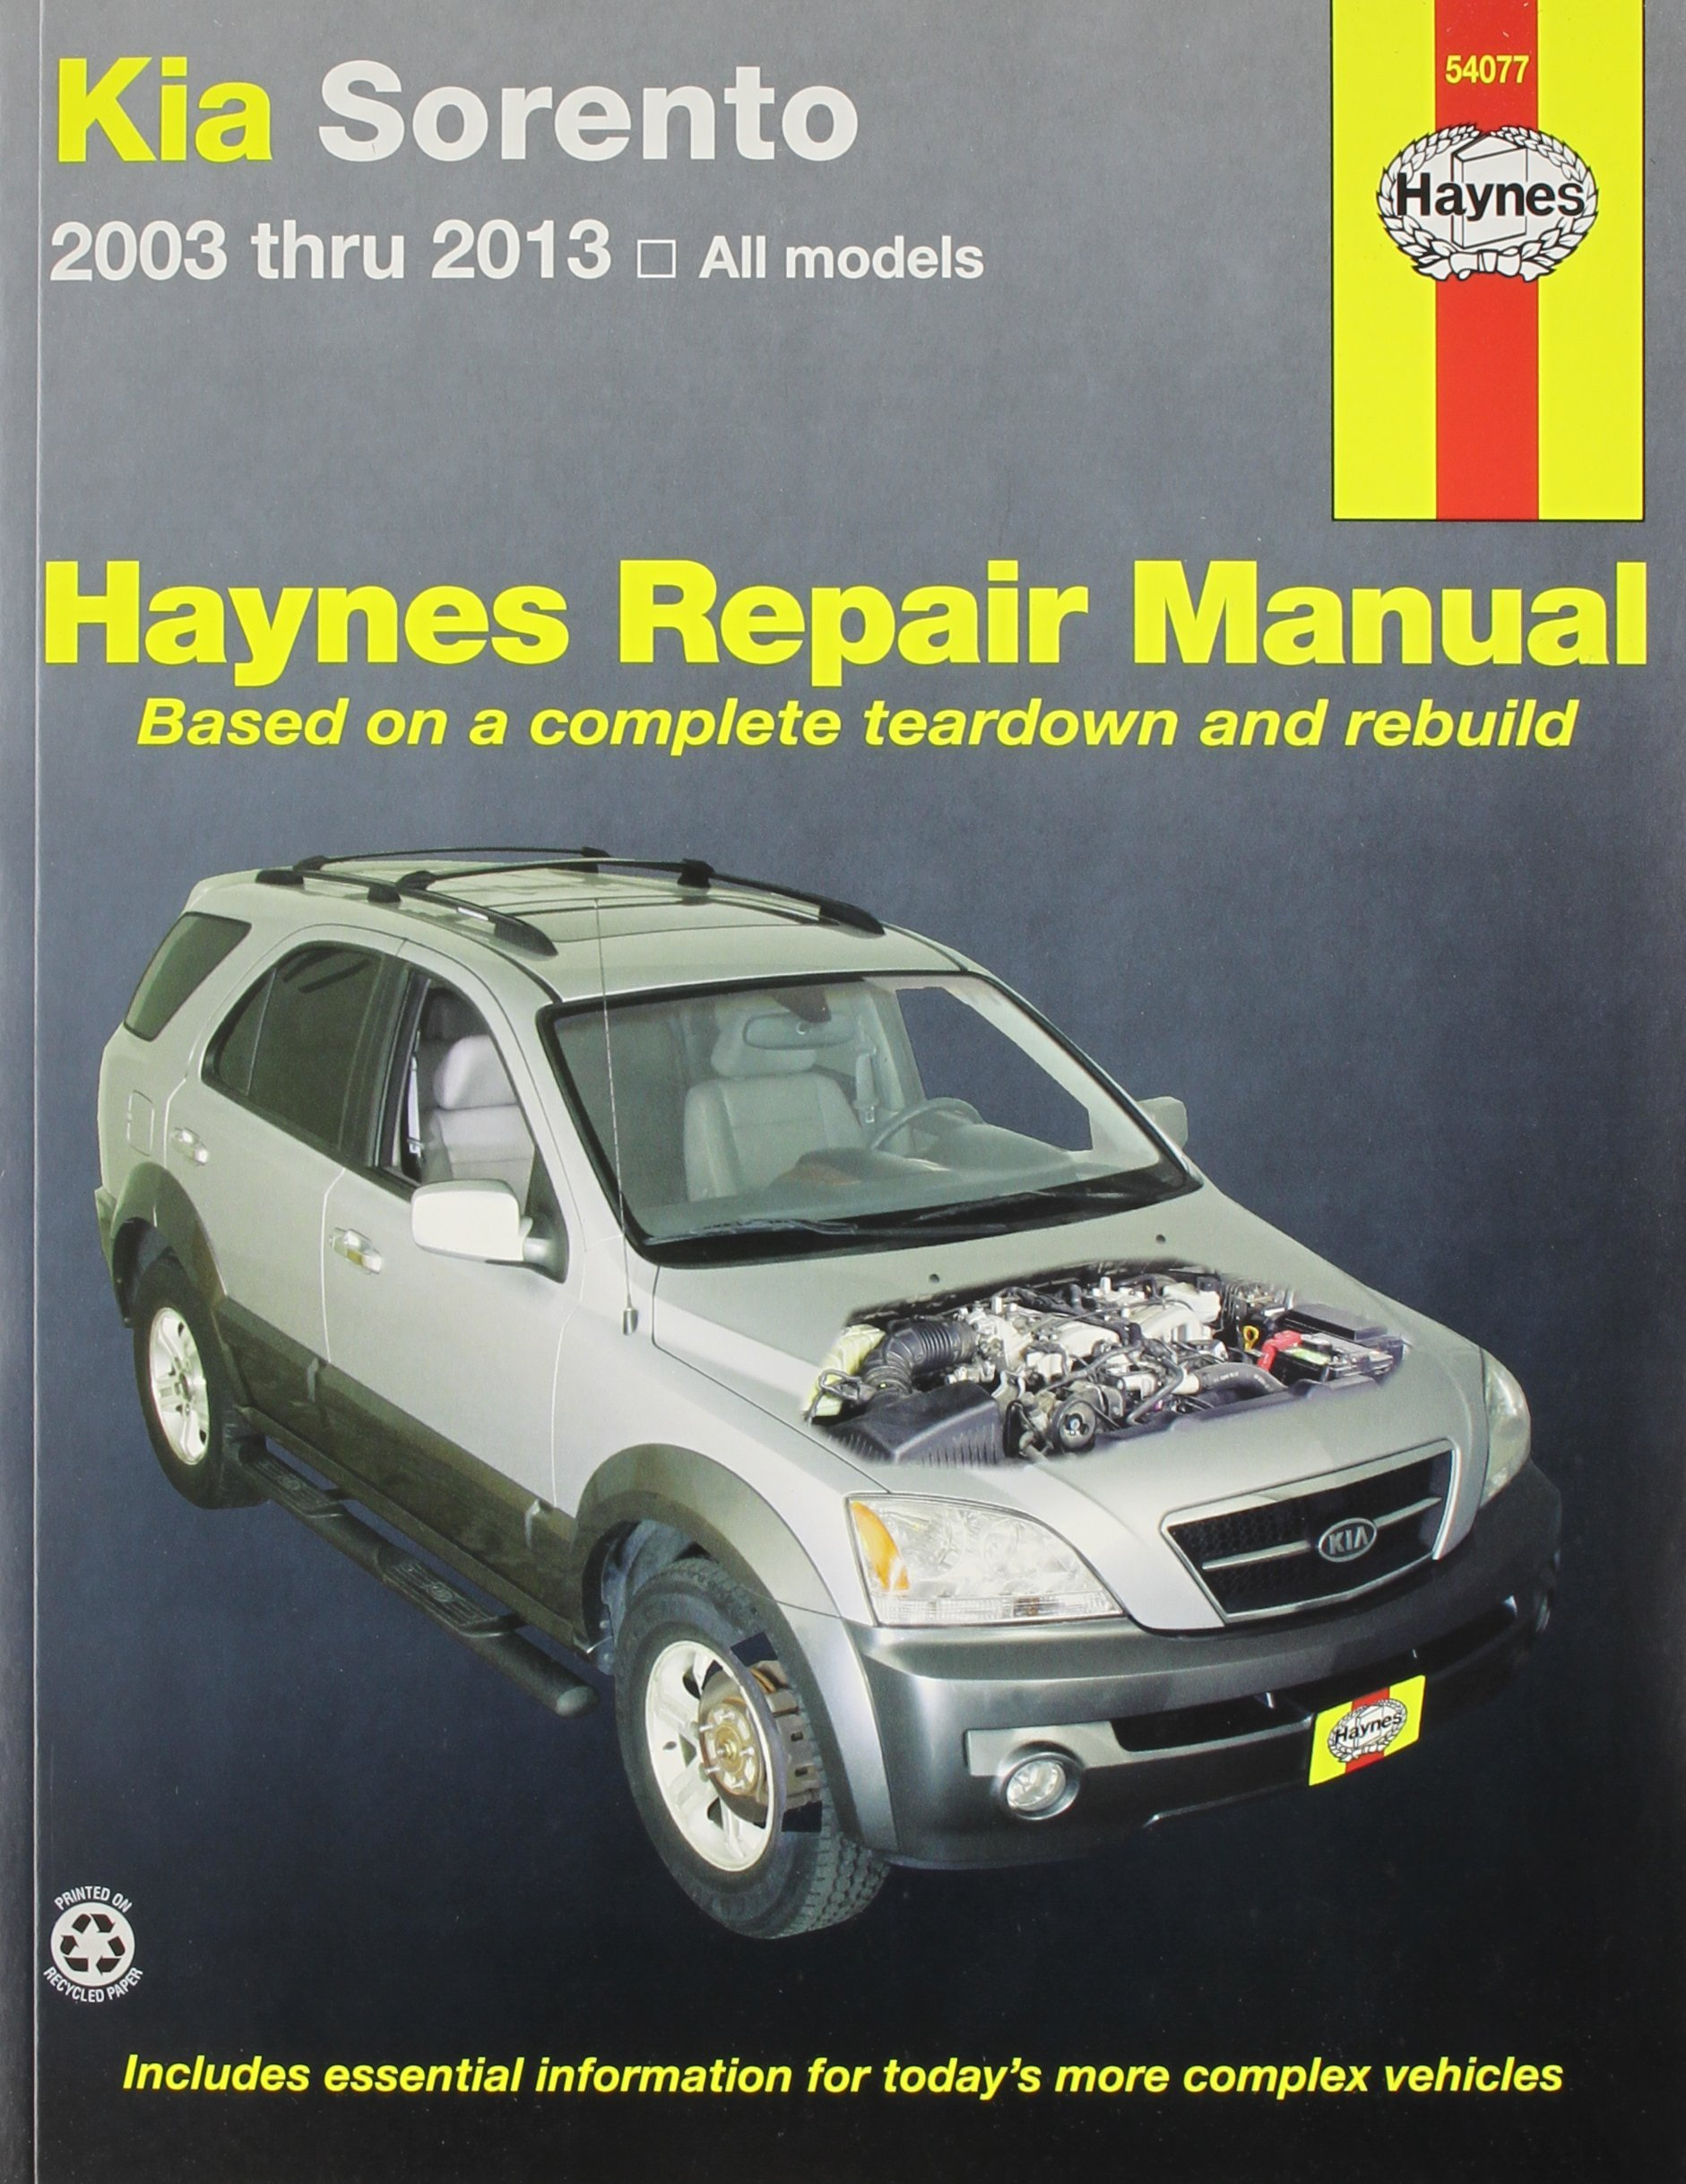 Kia Sorento Automotive Repair Manual: 2003-13 (Haynes Automotive Repair  Manuals) by HAYNES MANUALS INC (1-Oct-2013) Paperback: Amazon.com: Books